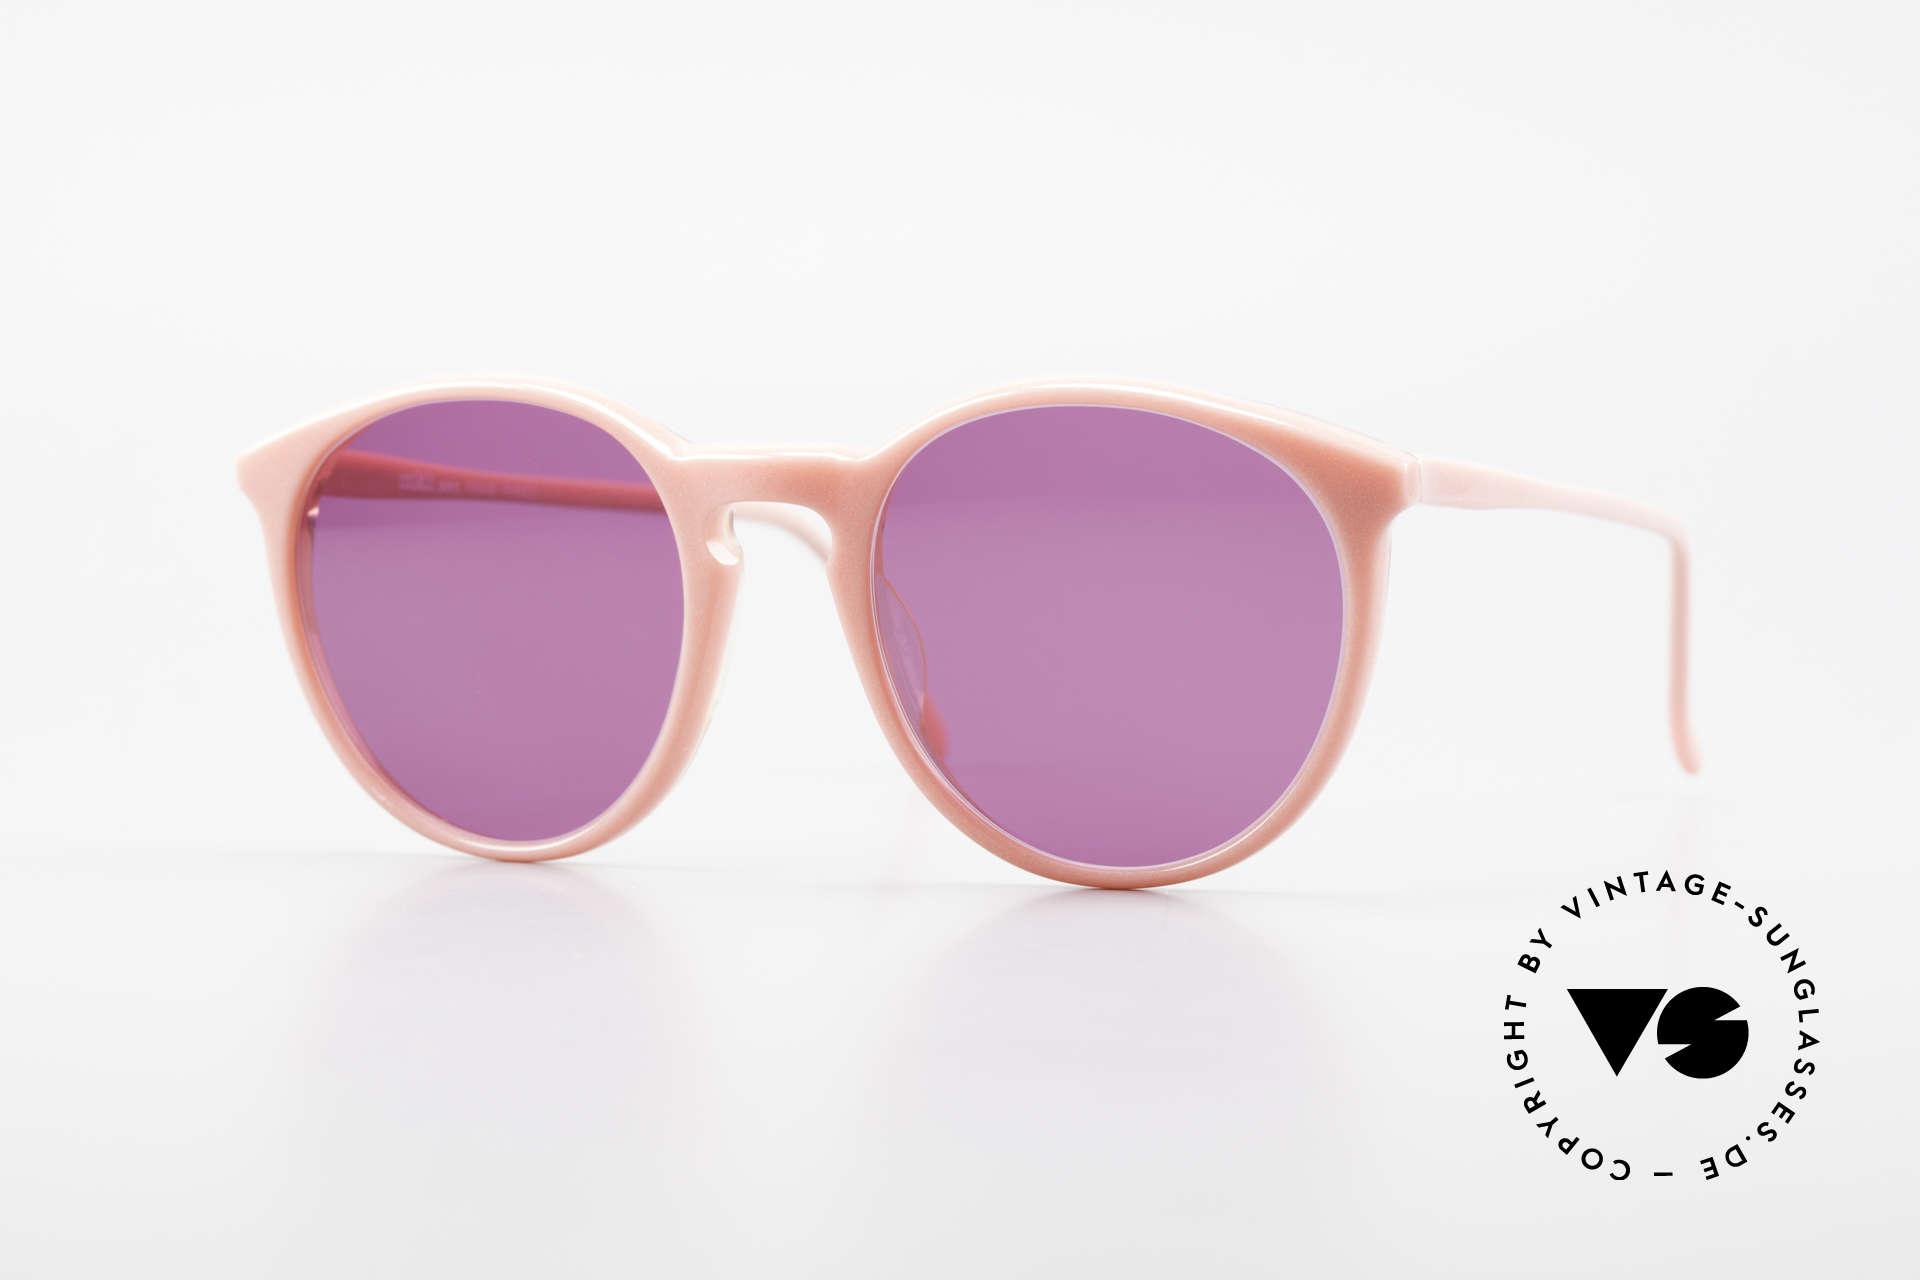 Alain Mikli 901 / 081 Panto Sonnenbrille Lila Pink, elegante ALAIN MIKLI Paris Designer-Sonnenbrille, Passend für Damen